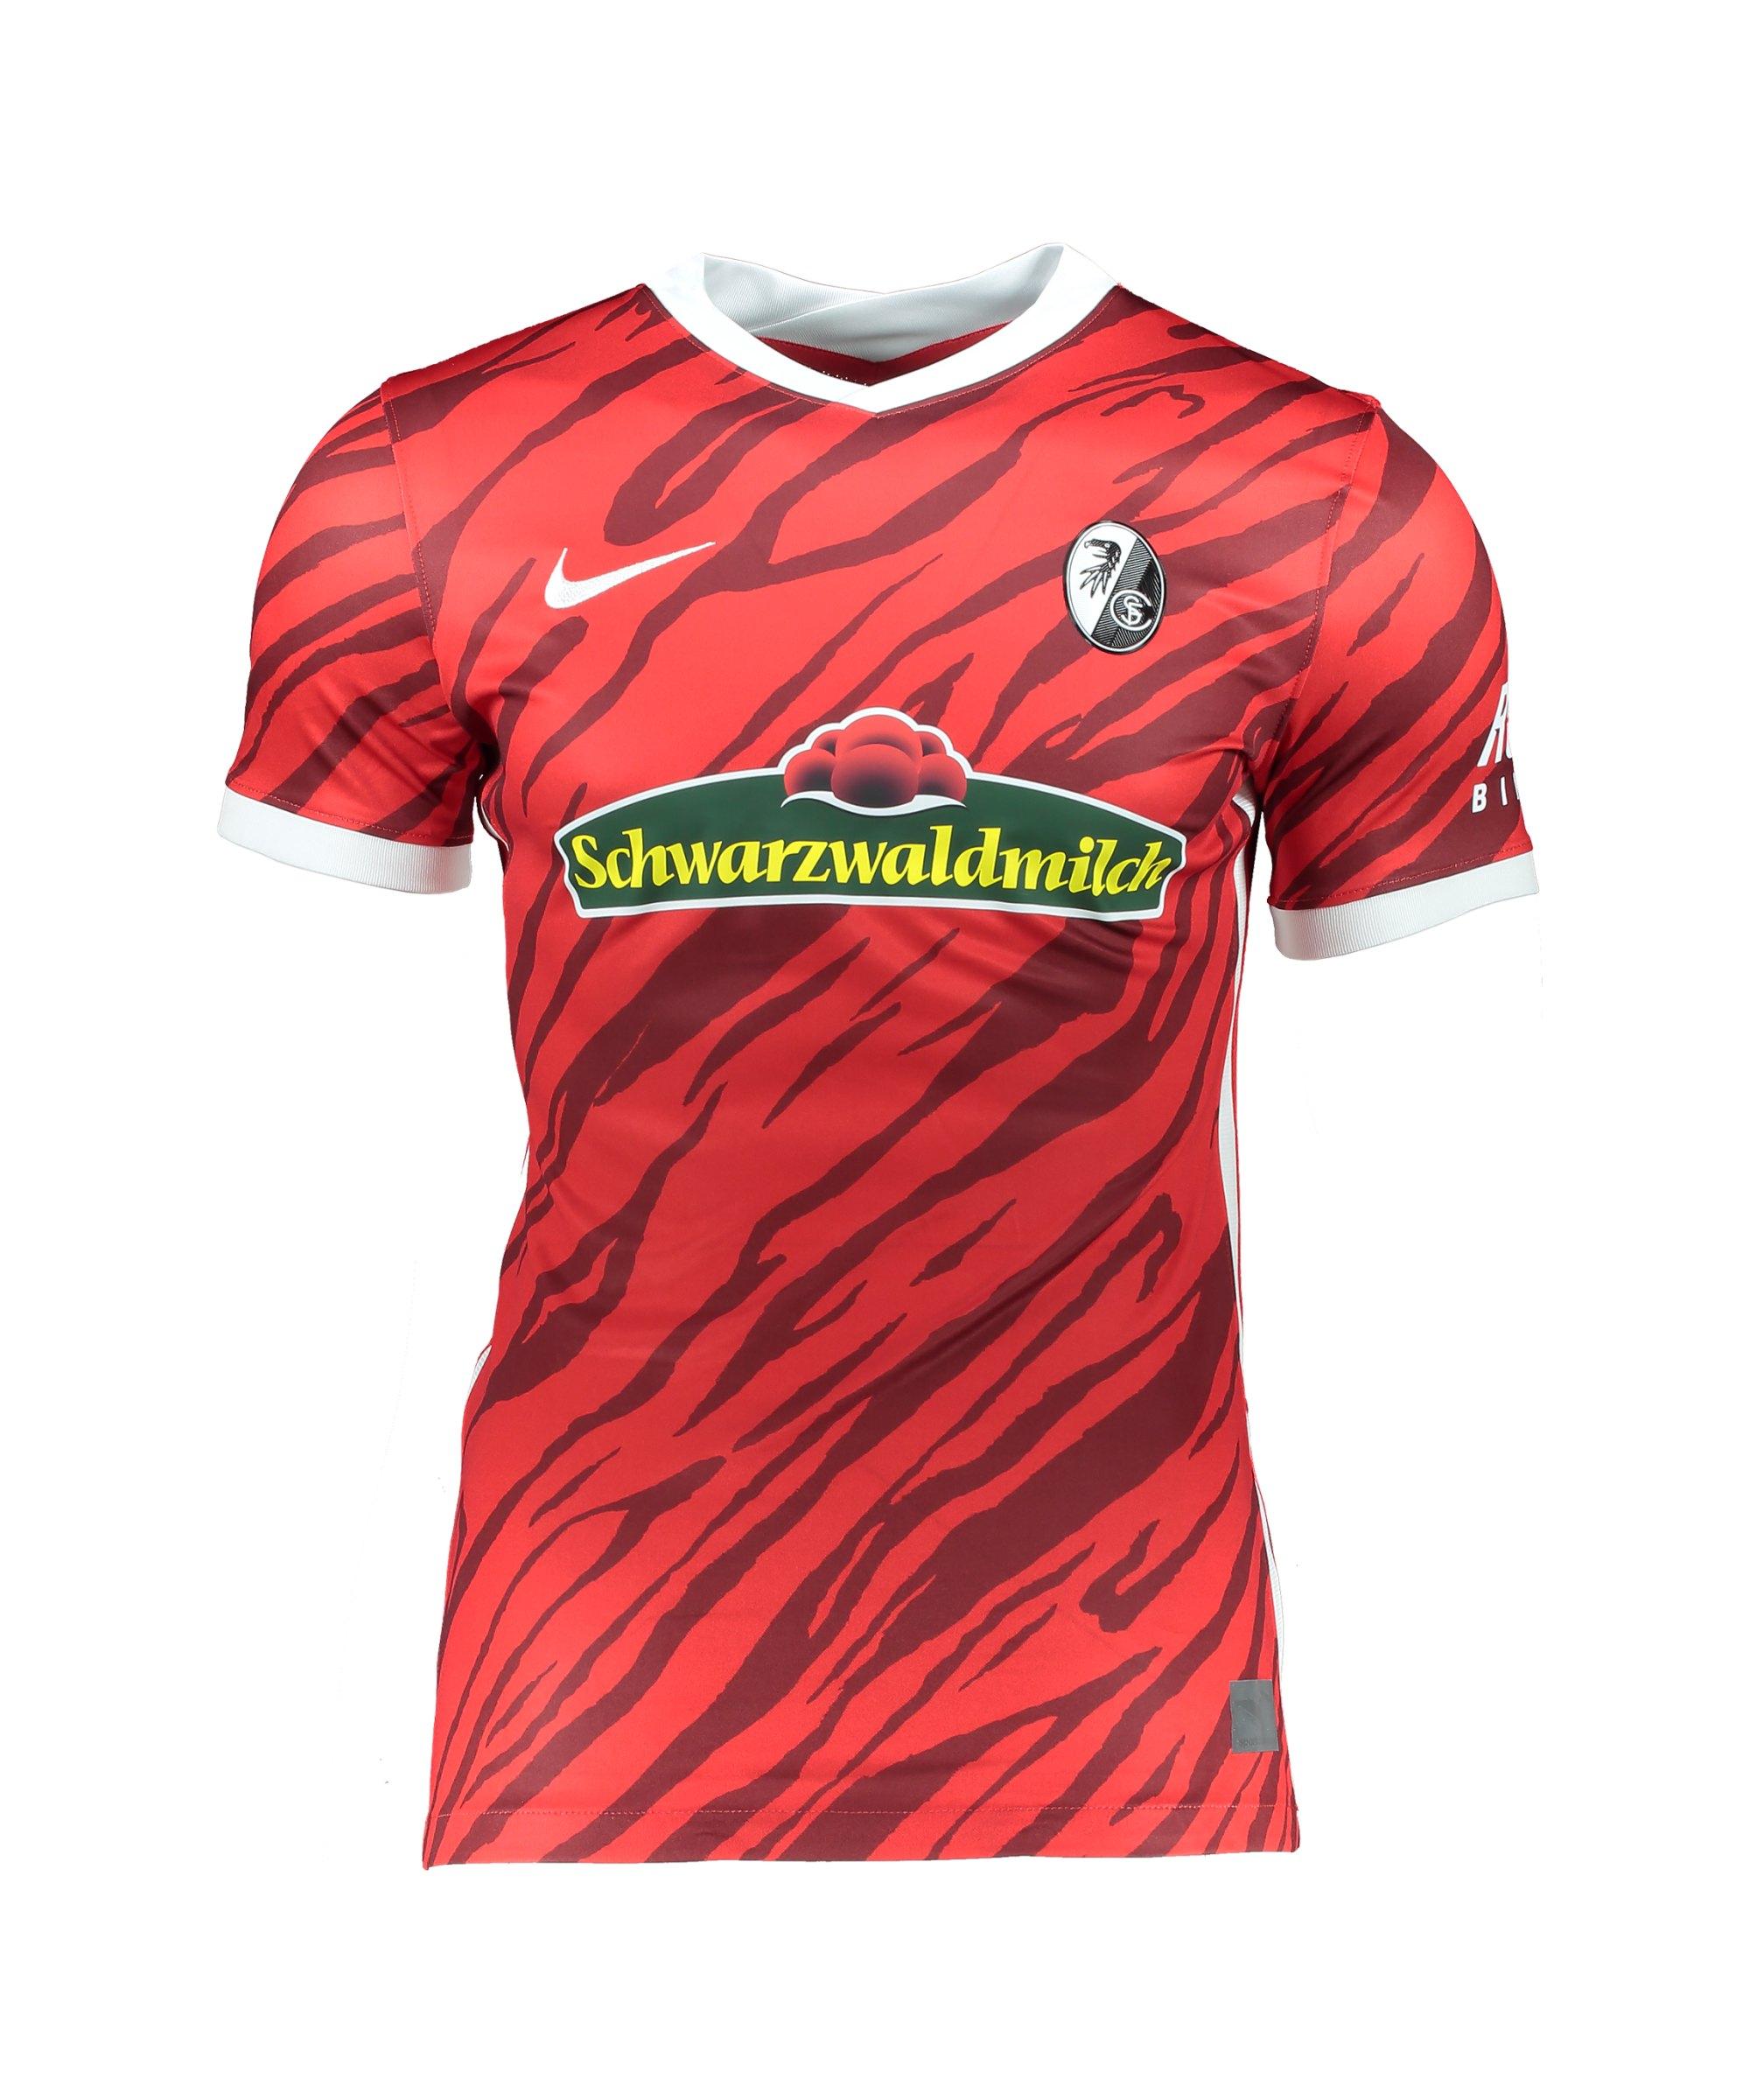 Nike SC Freiburg Trikot Home Match Fit 2021/2022 Rot F657 - rot